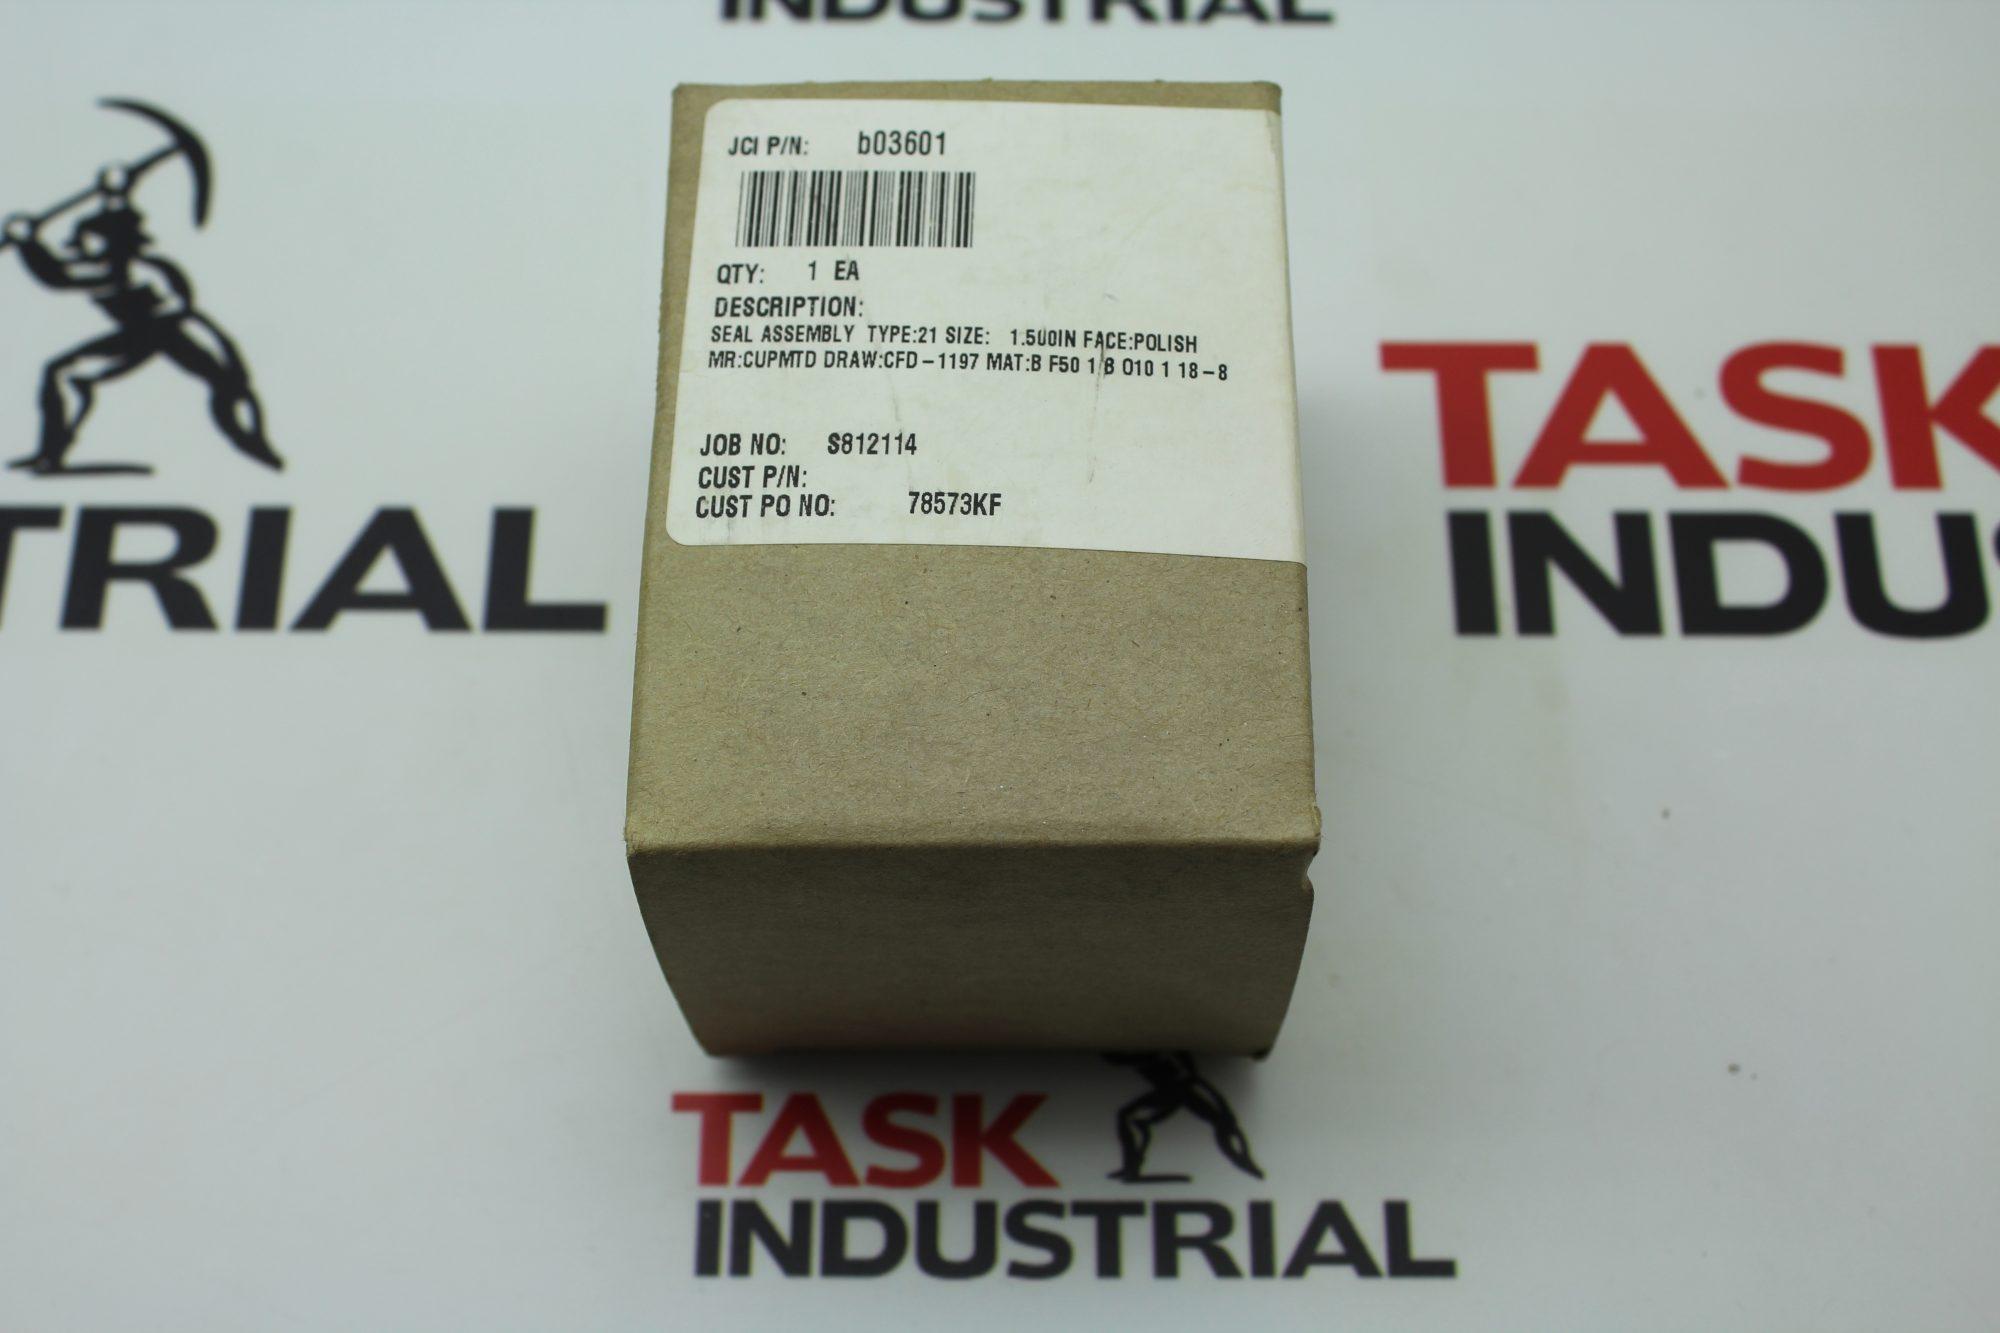 John Crane Seal Assembly Type: 21 Size: 1.5'' B03601